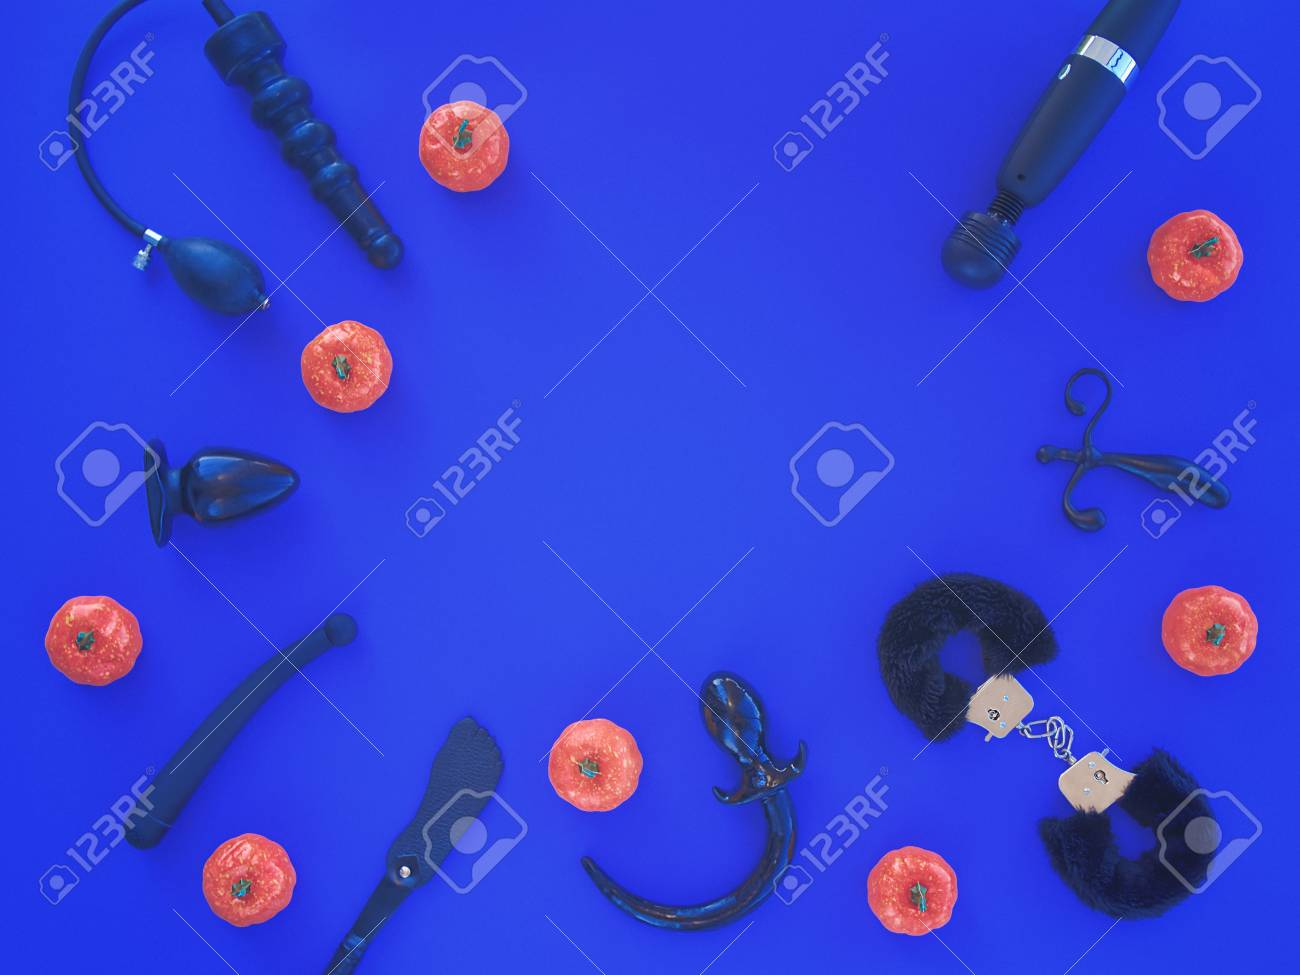 Anal Pump Pics sex toys (wand massager, vibrator, handcuffs, anal plug, pump..